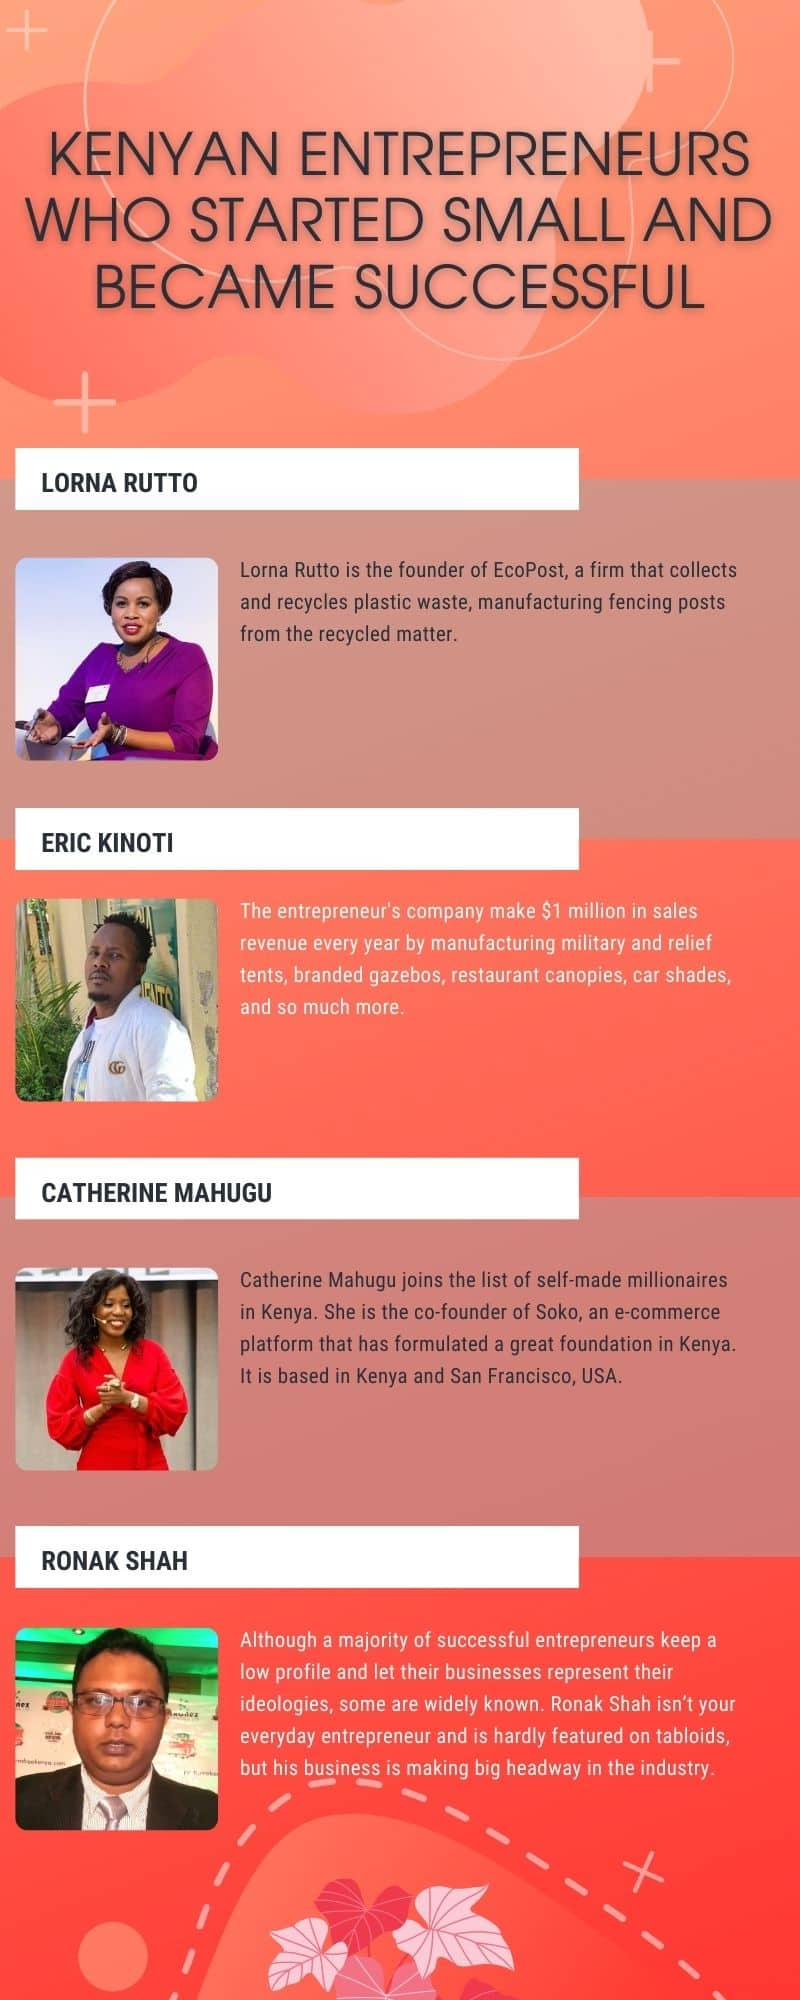 Kenyan entrepreneurs who became successful